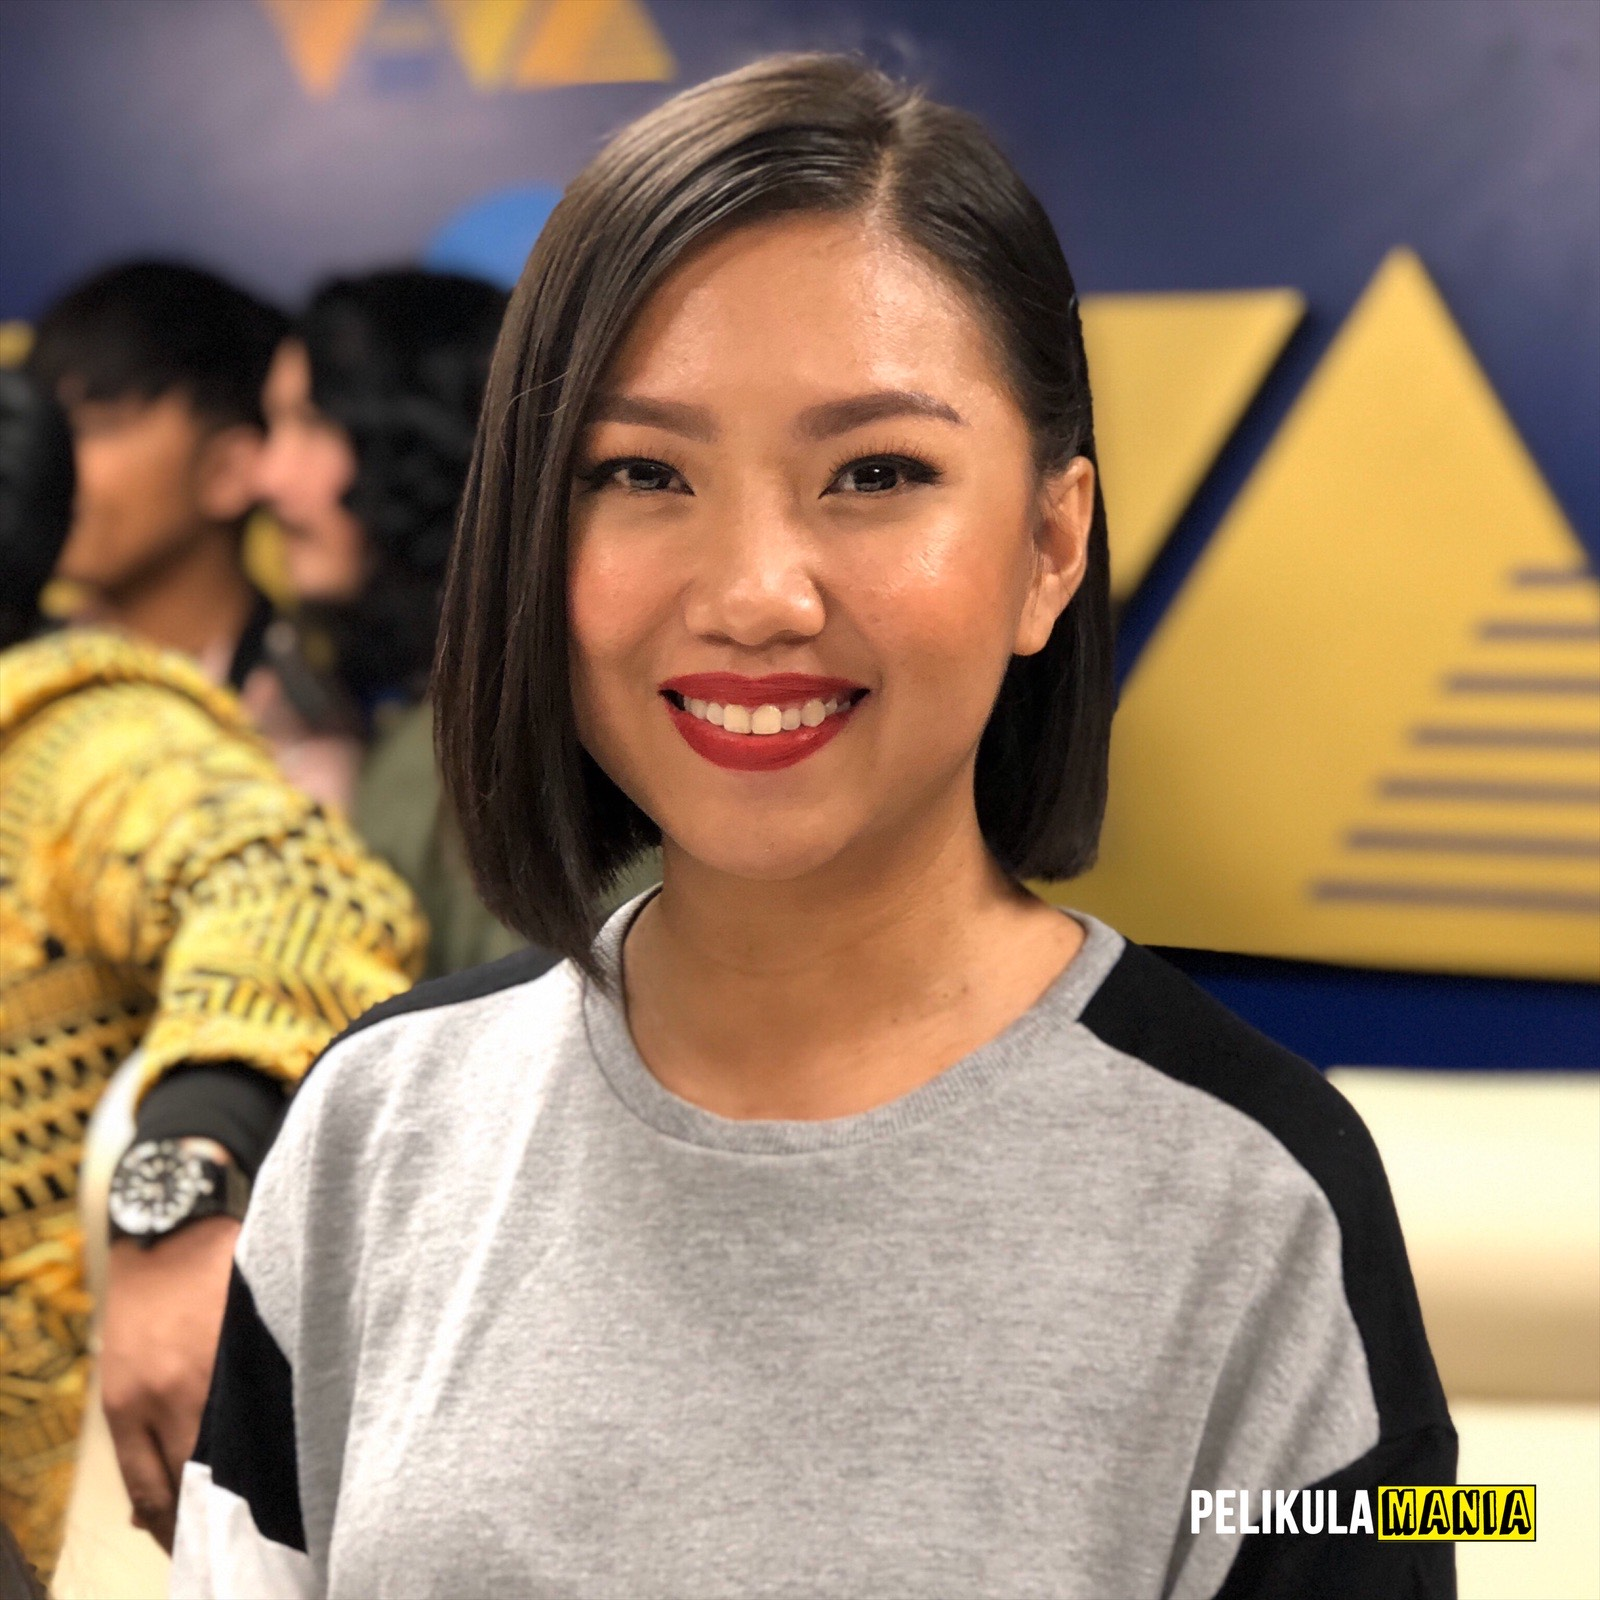 Yumi Lacsamana Tililing